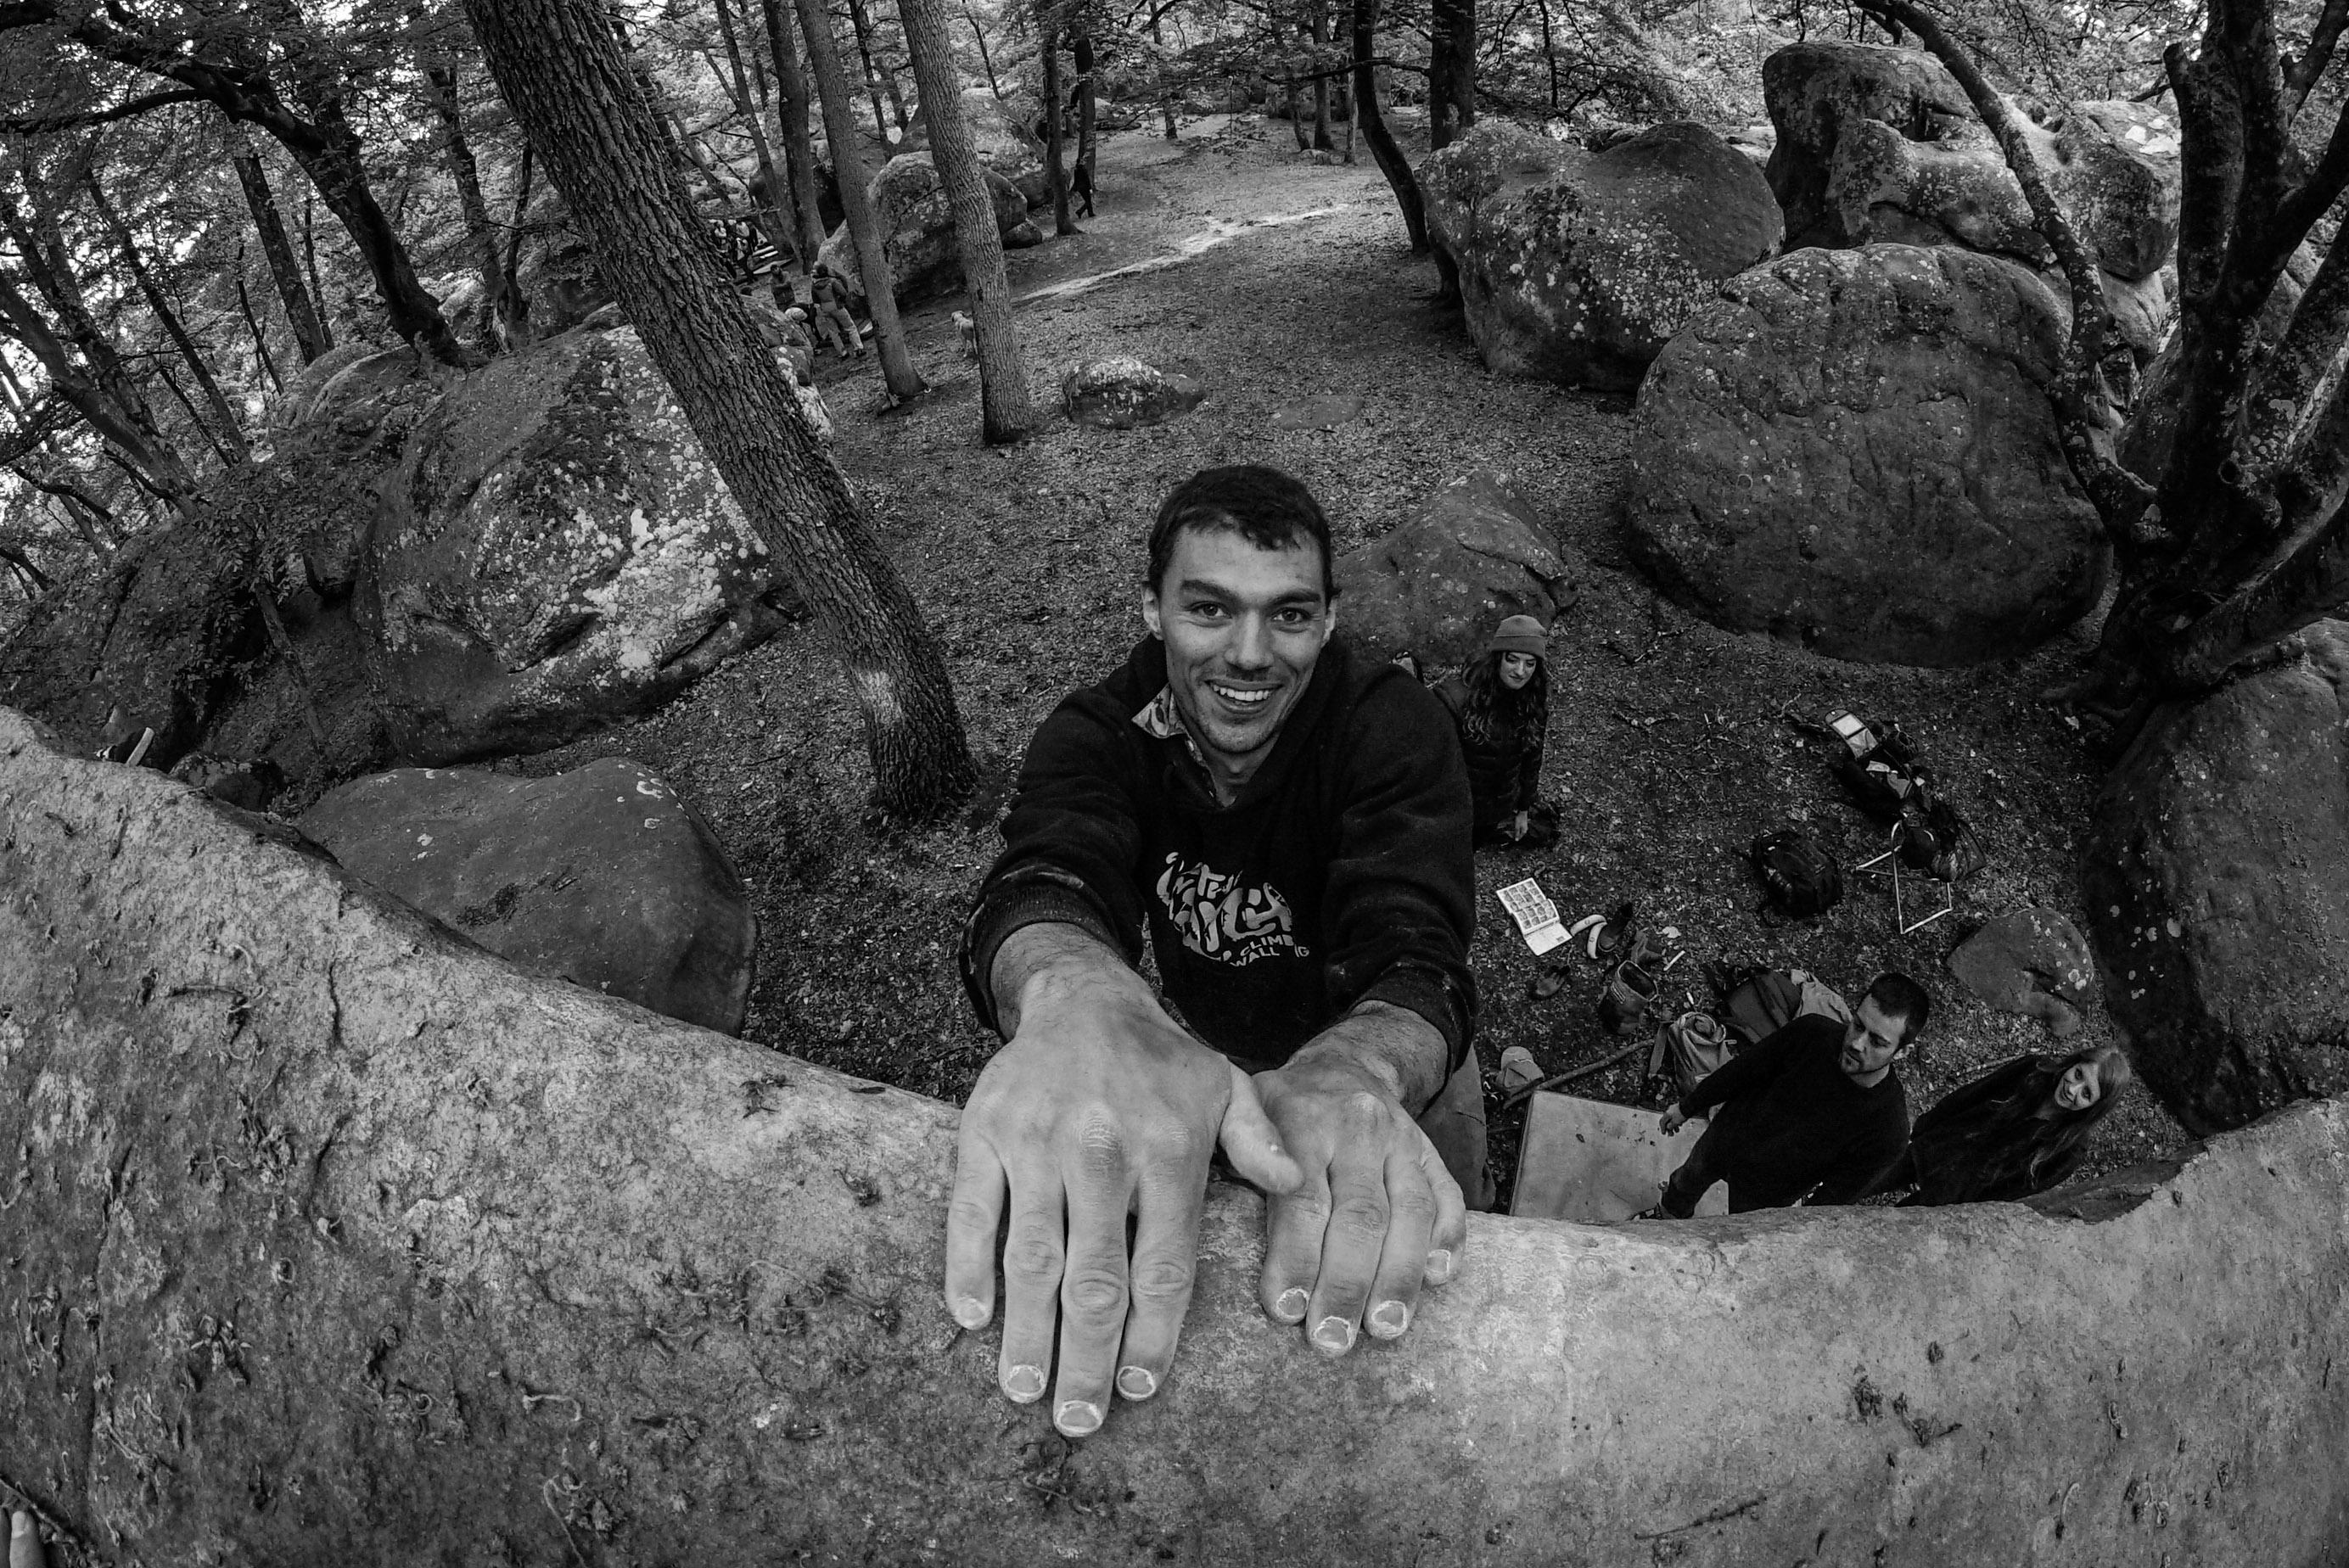 fontainbleau climbing 2016 mike brindley-101